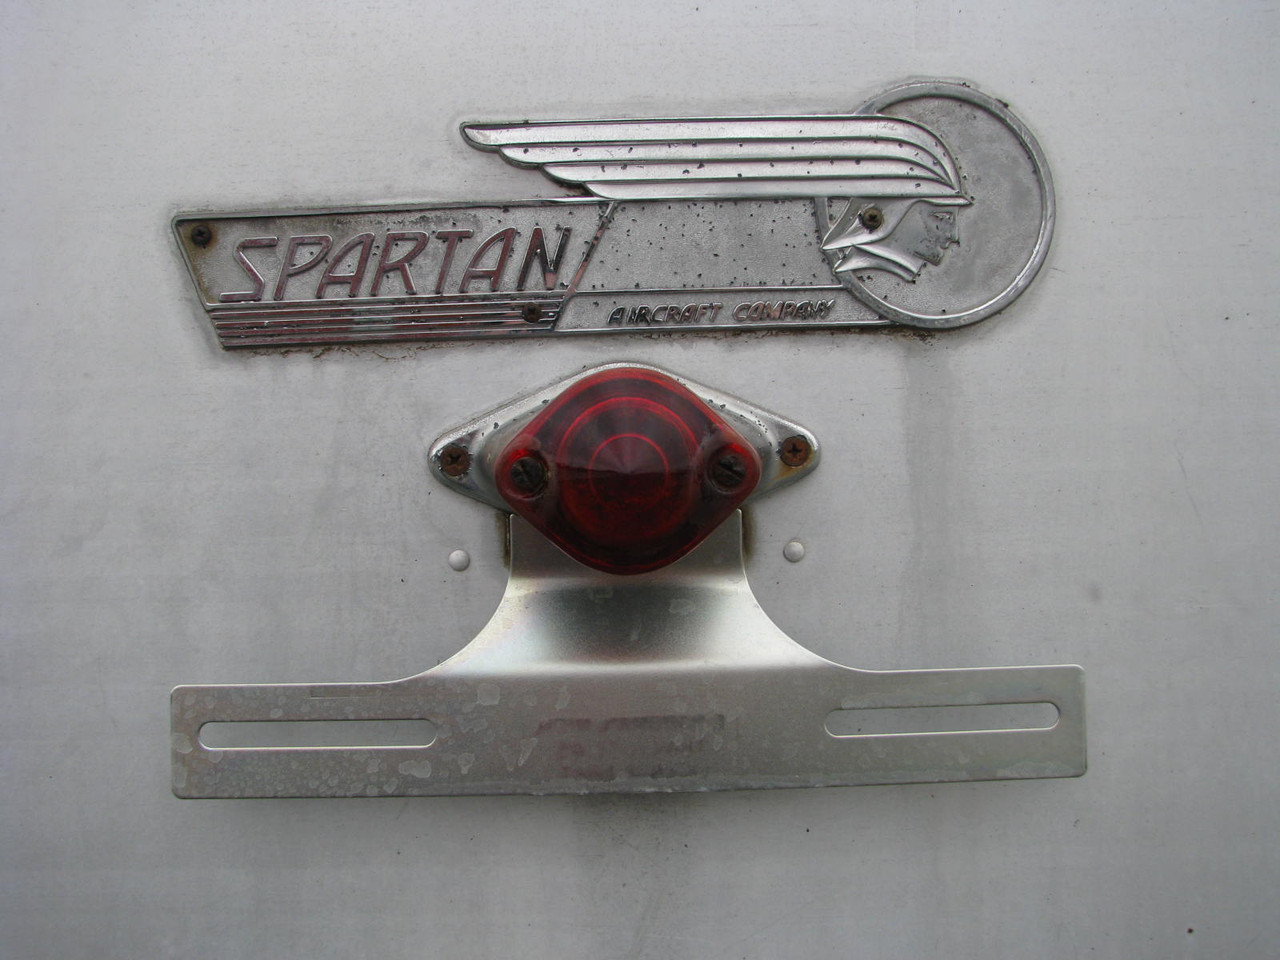 1954 Spartan 43' Imperial Mansion #1250